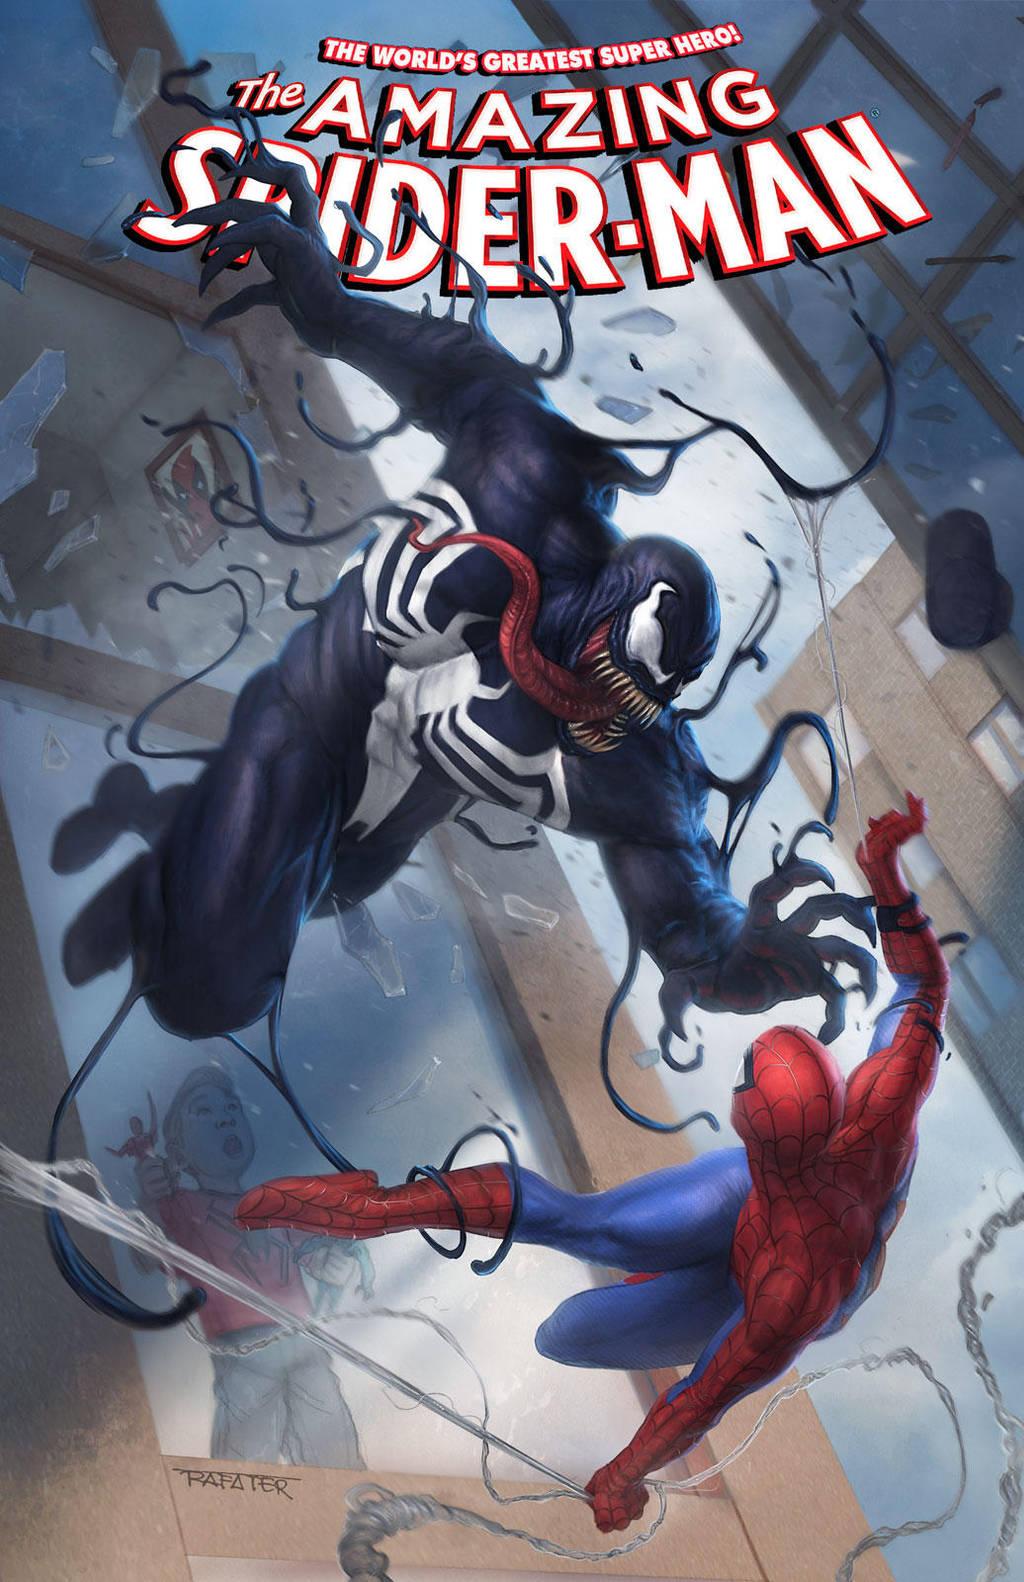 Venom vs. Spider-man cover by rafater